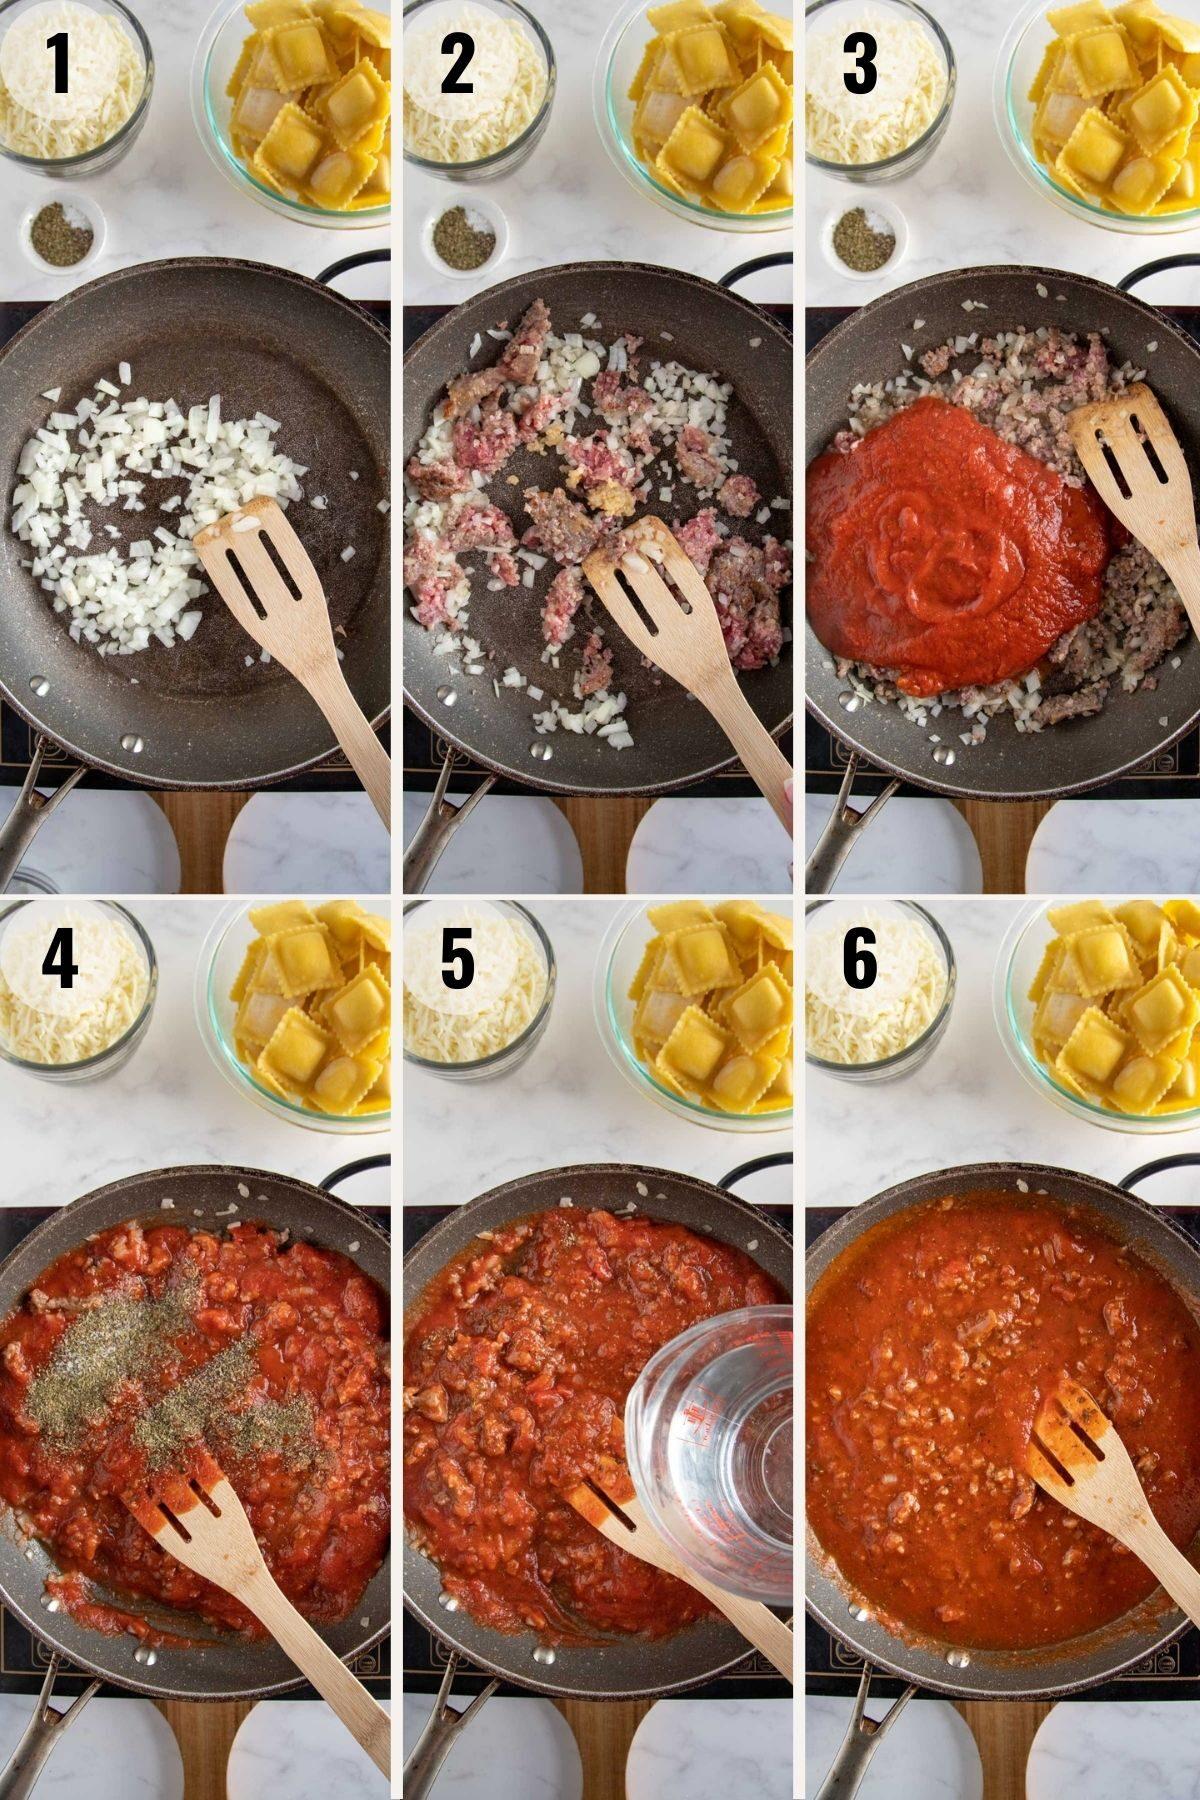 step by step to make sauce for ravioli lasagna